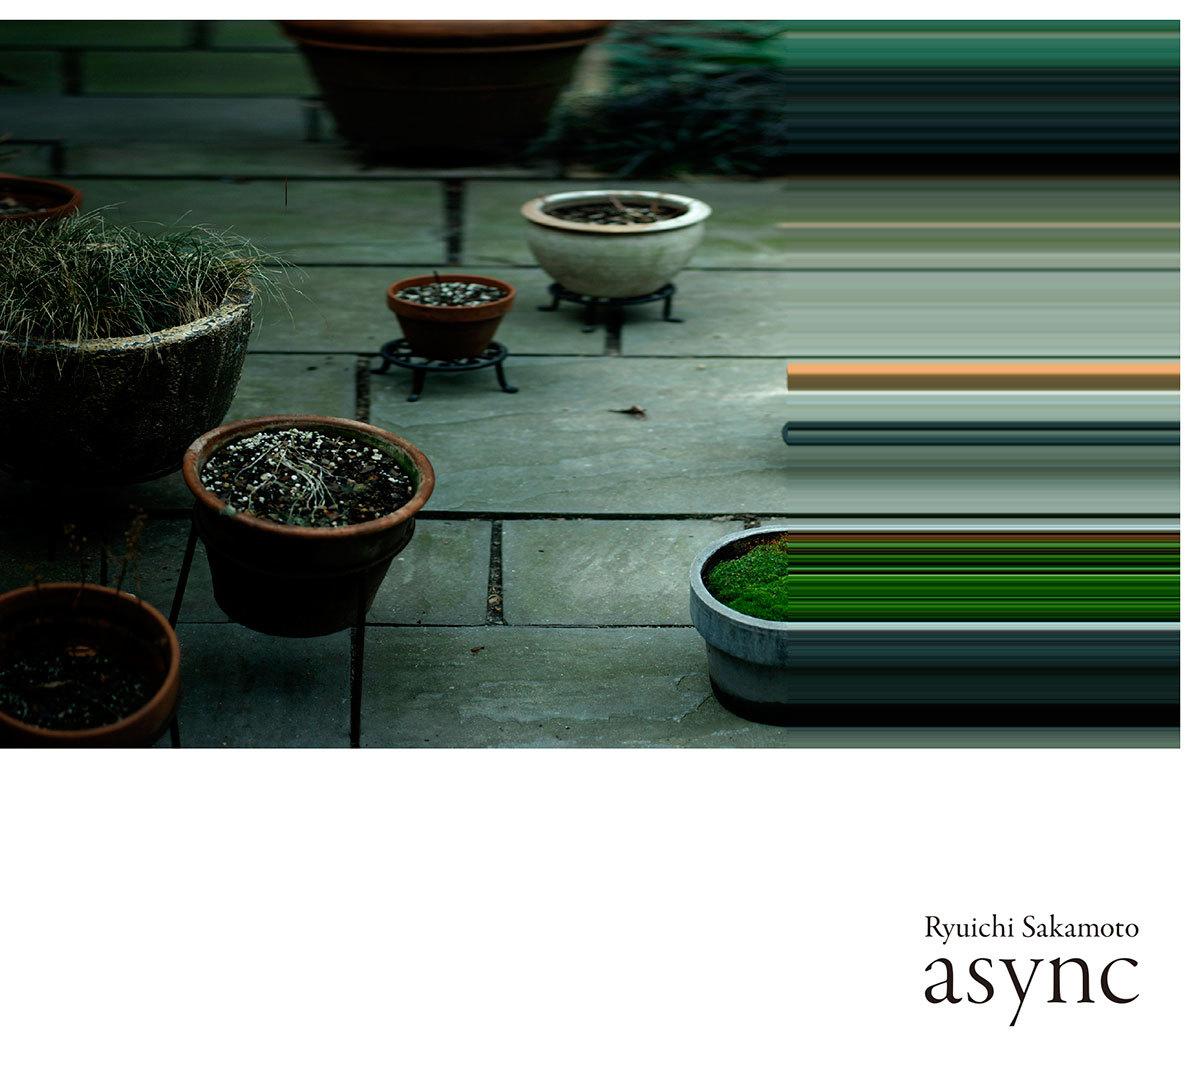 ryuichi-sakamoto-async-body-image-148958